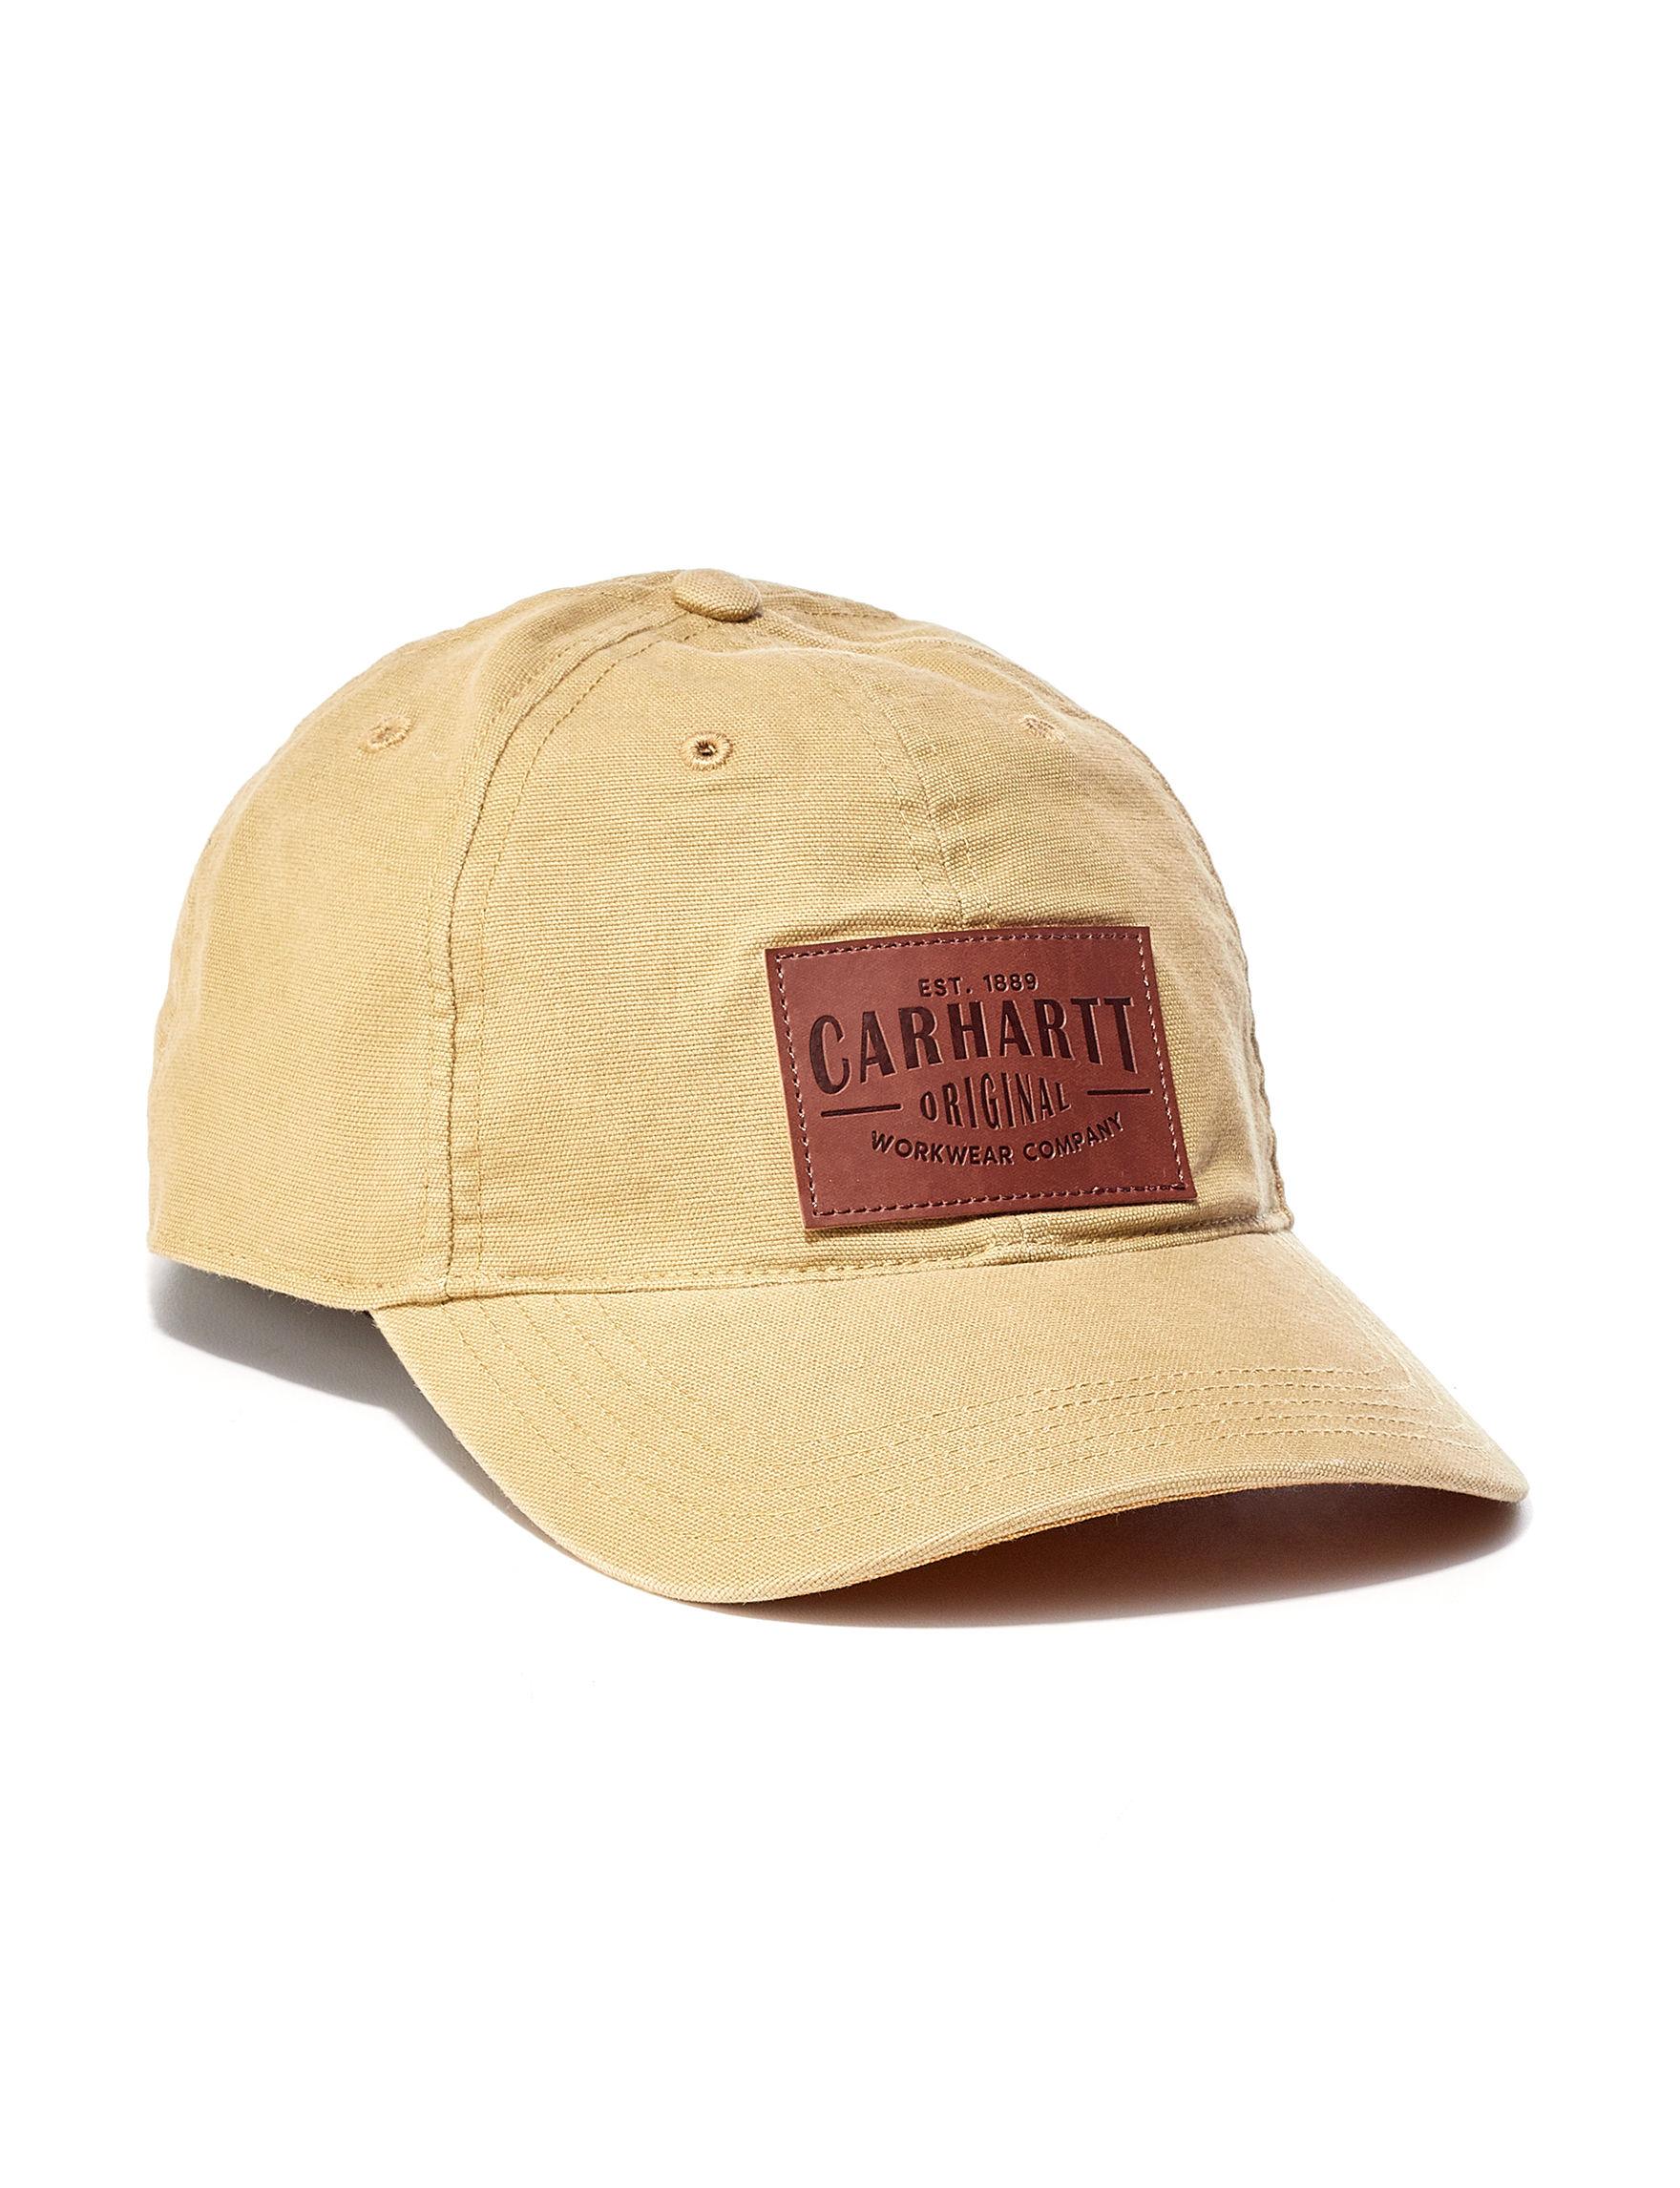 Carhartt Dark Khaki Hats & Headwear Baseball Caps